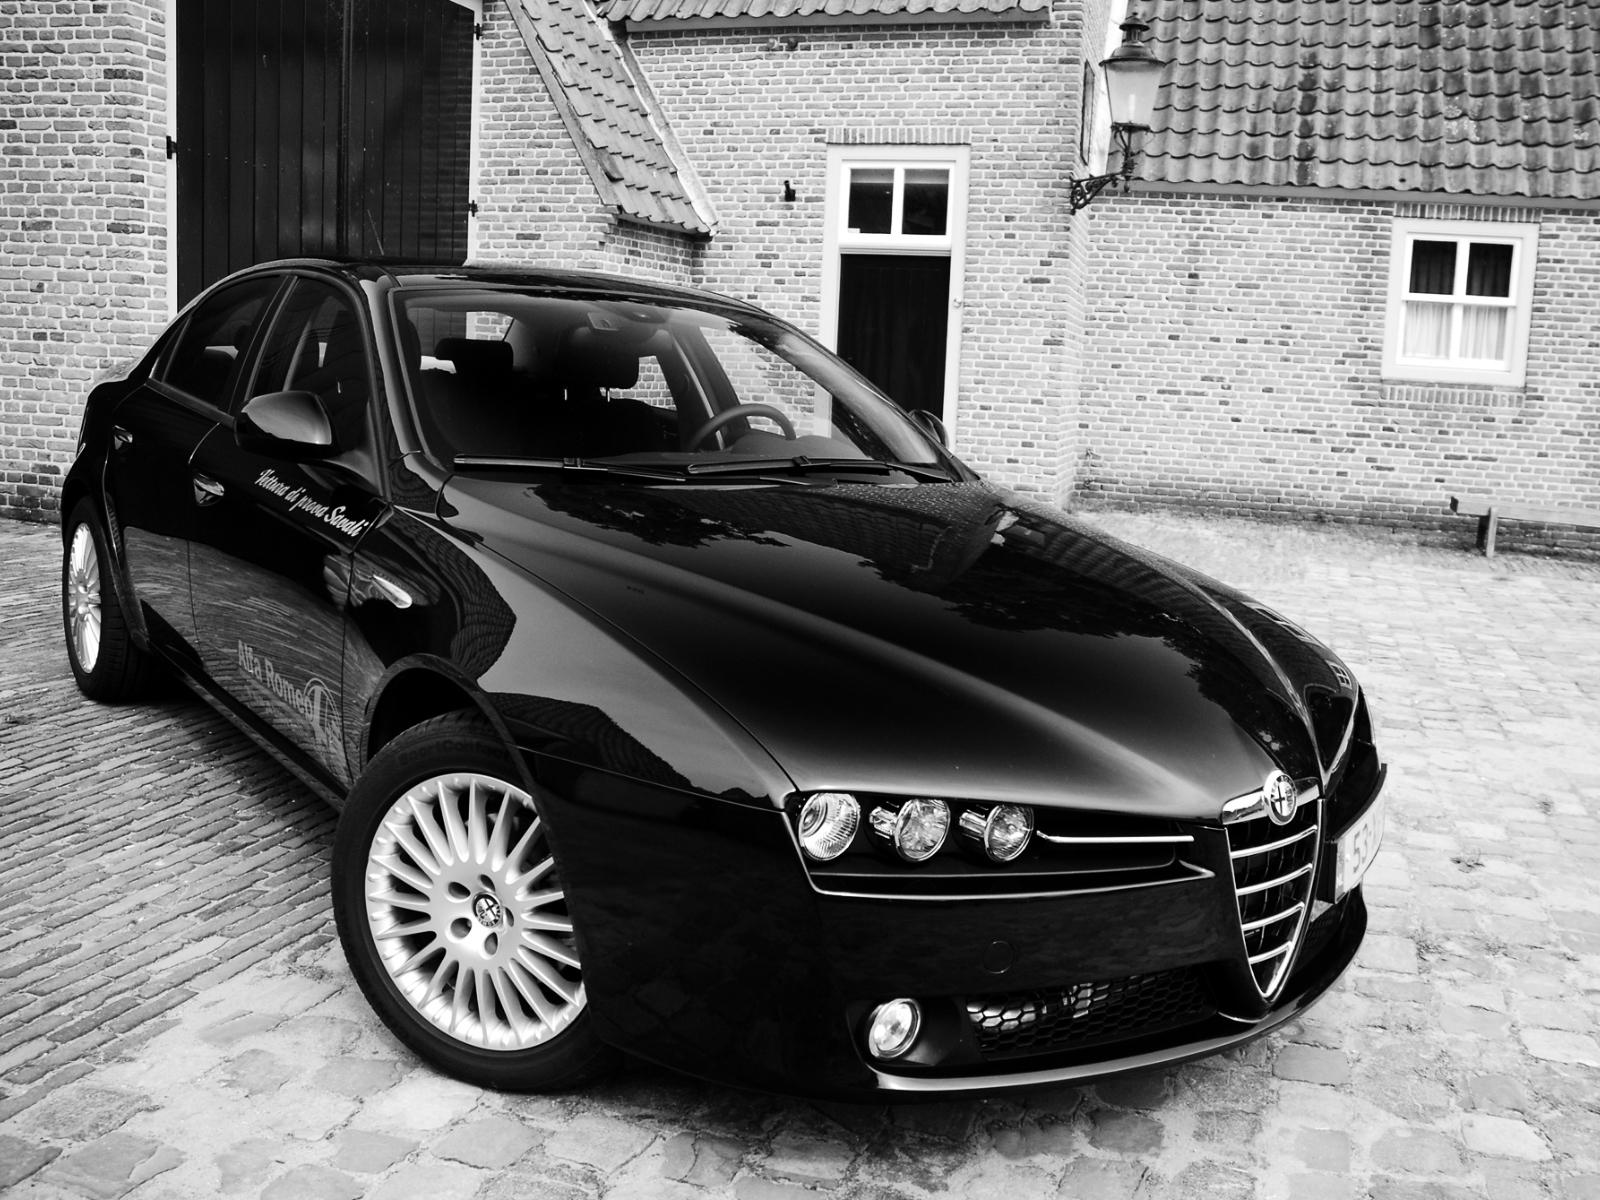 Alfa Romeo 159 Wallpapers Top Free Alfa Romeo 159 Backgrounds Wallpaperaccess